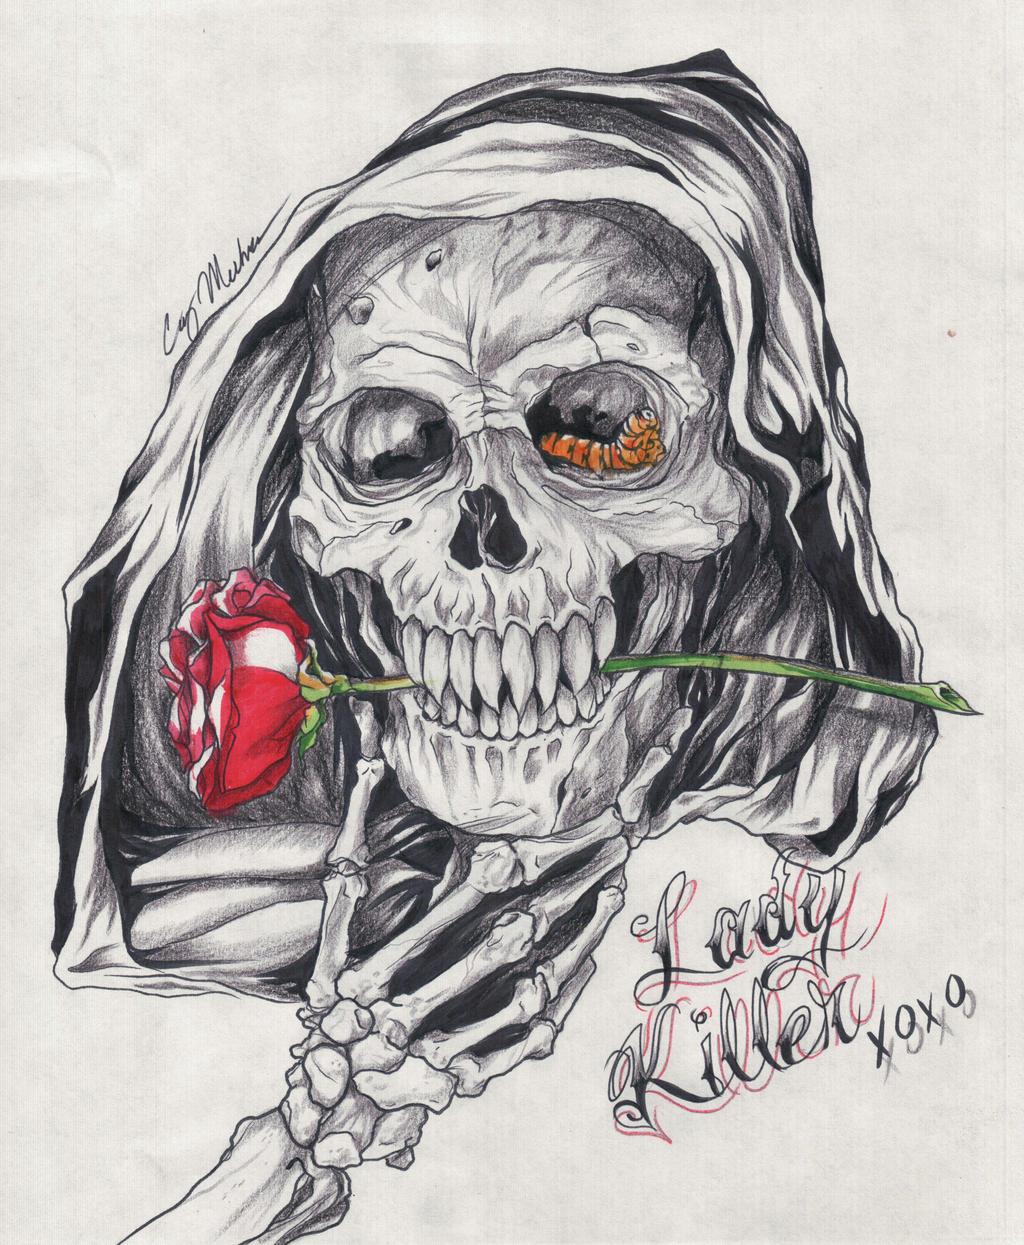 lady killer reaper tattoo design by narcissustattoos on deviantart. Black Bedroom Furniture Sets. Home Design Ideas